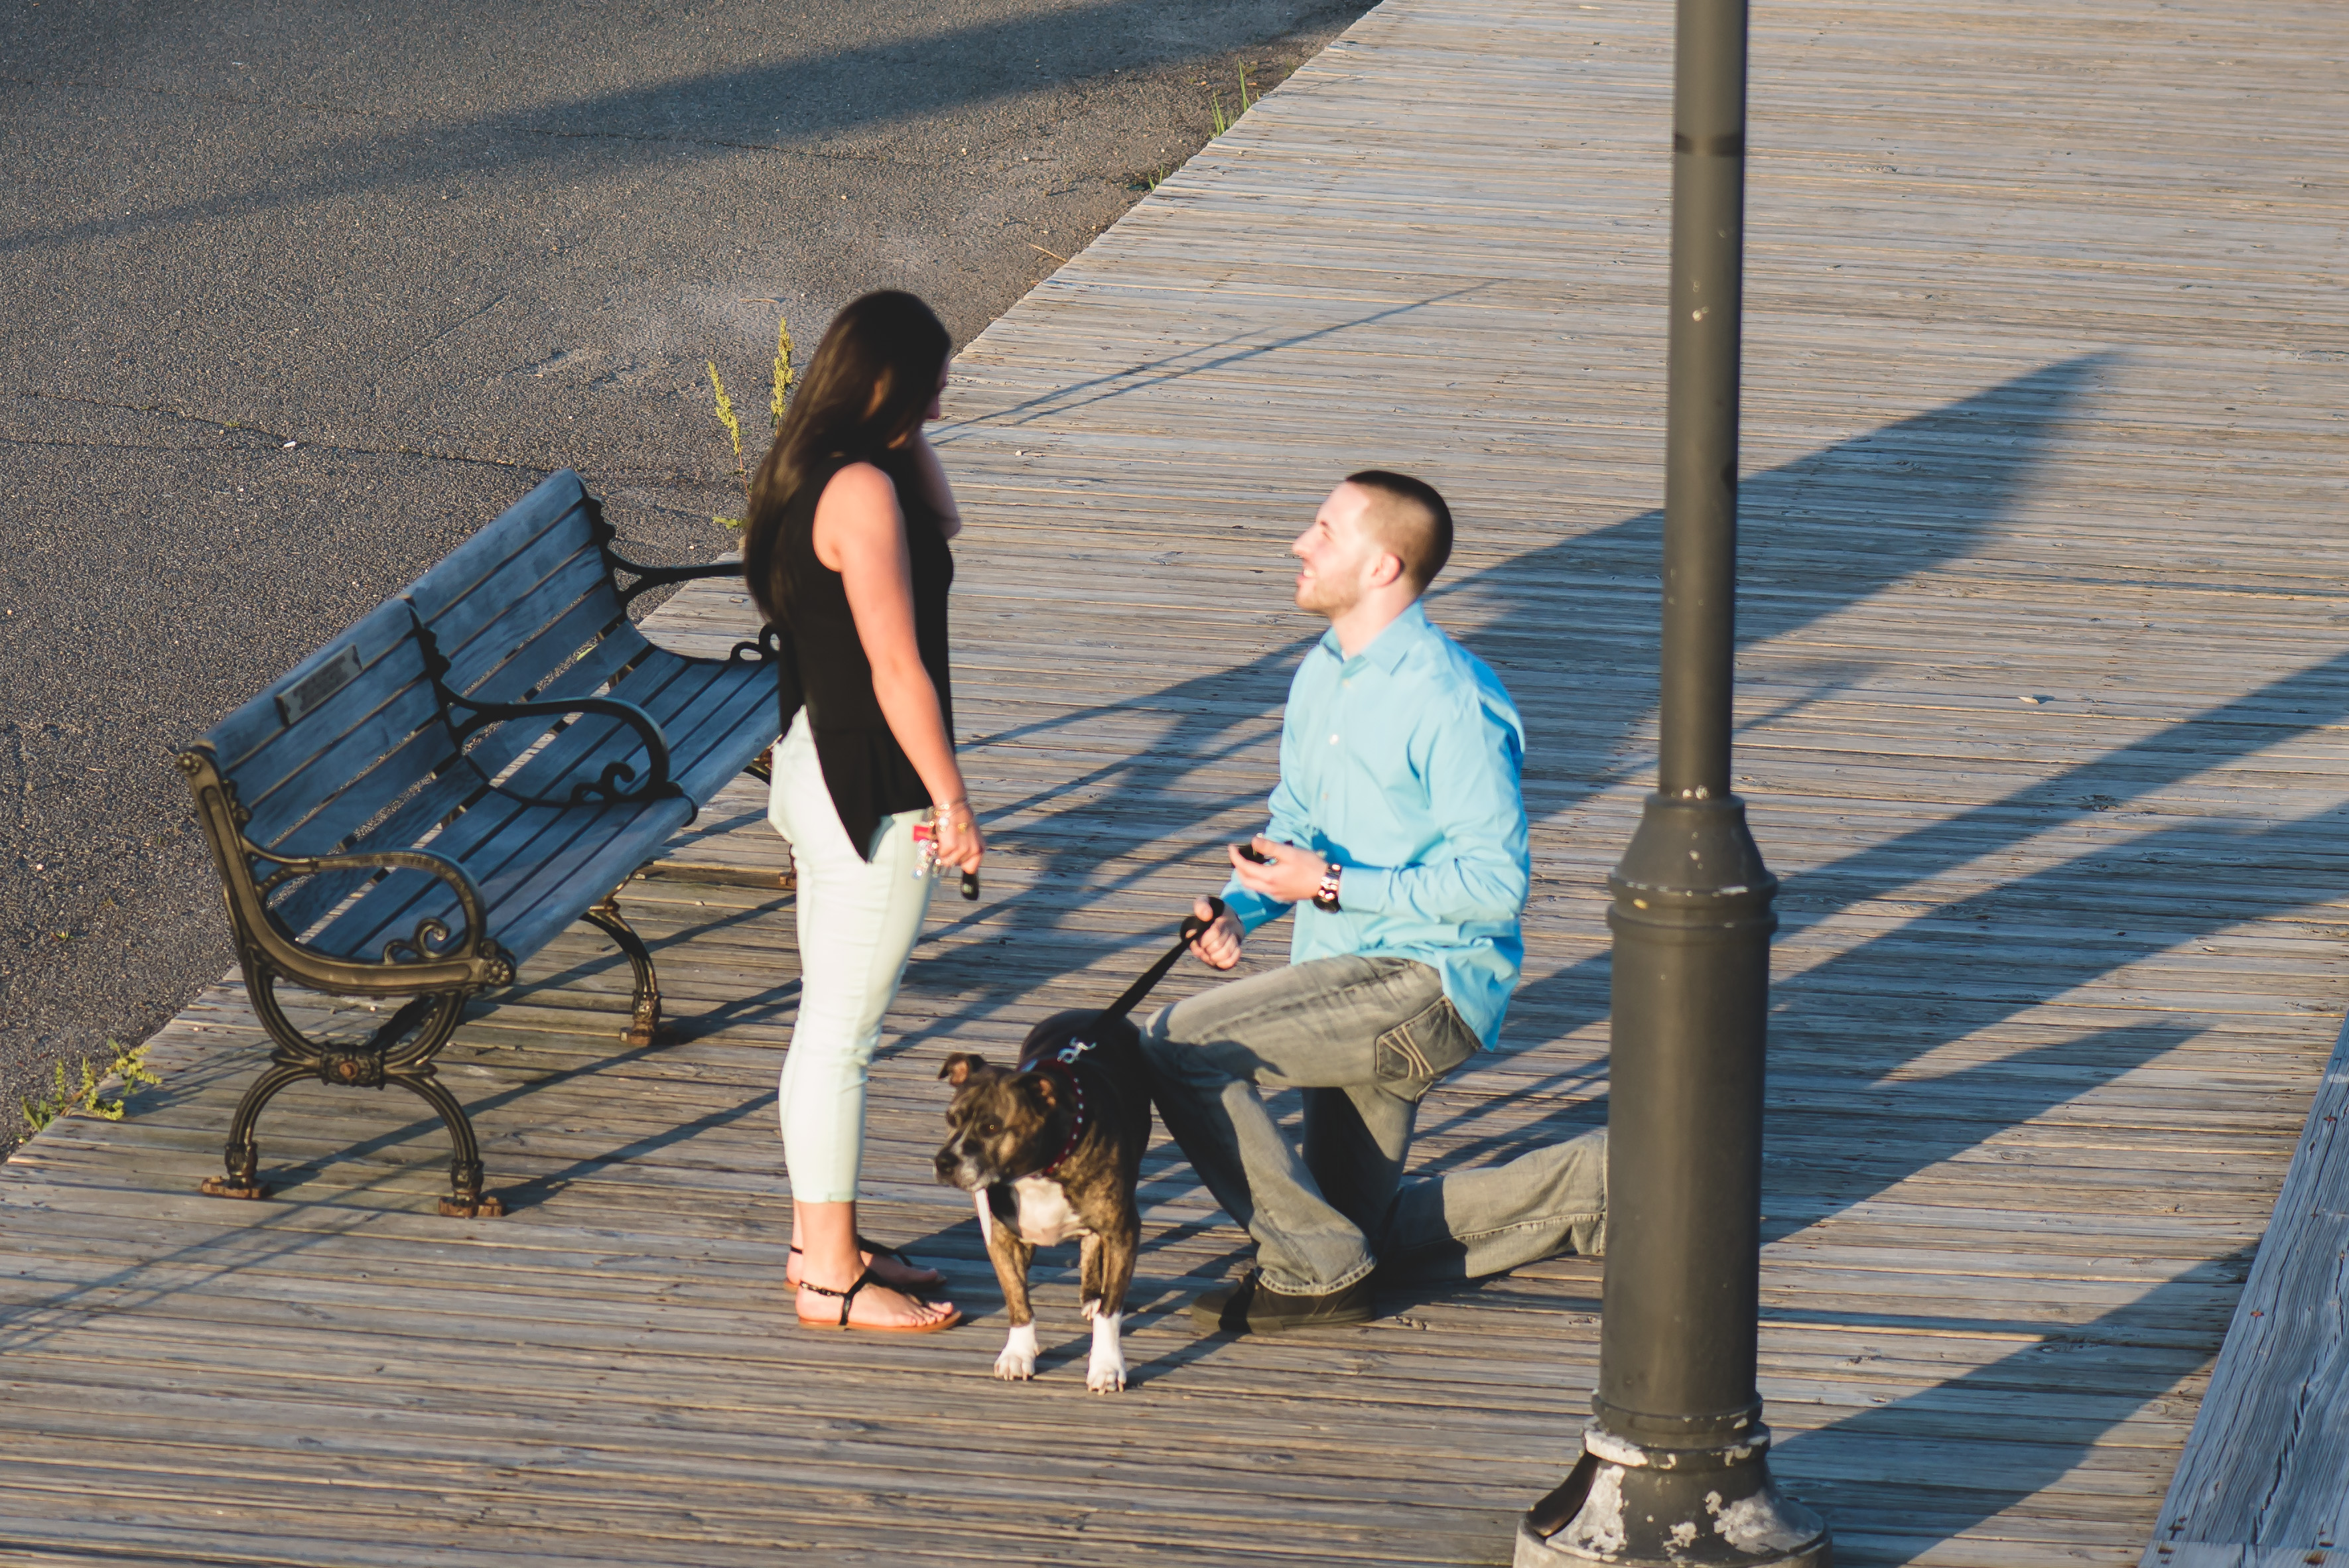 Image 5 of Dog Helps with Scavenger Hunt Proposal